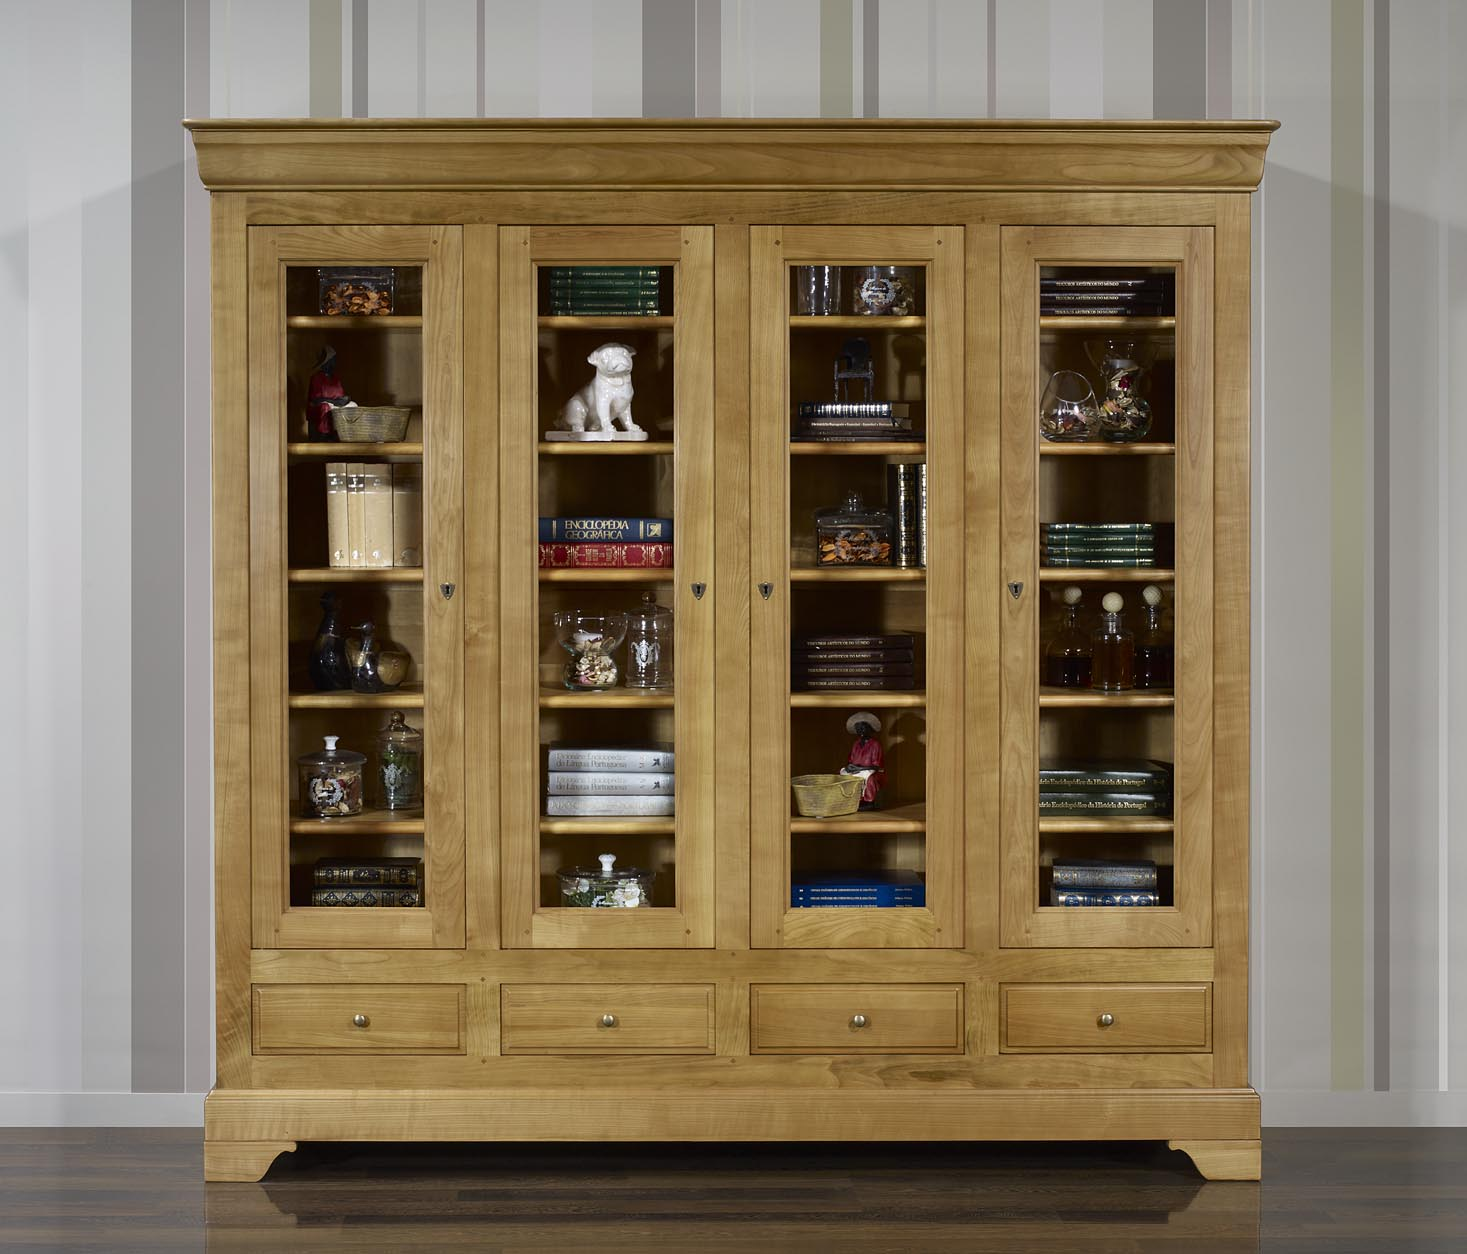 biblioth que 4 portes eliot en merisier massif de style louis philippe meuble en merisier massif. Black Bedroom Furniture Sets. Home Design Ideas